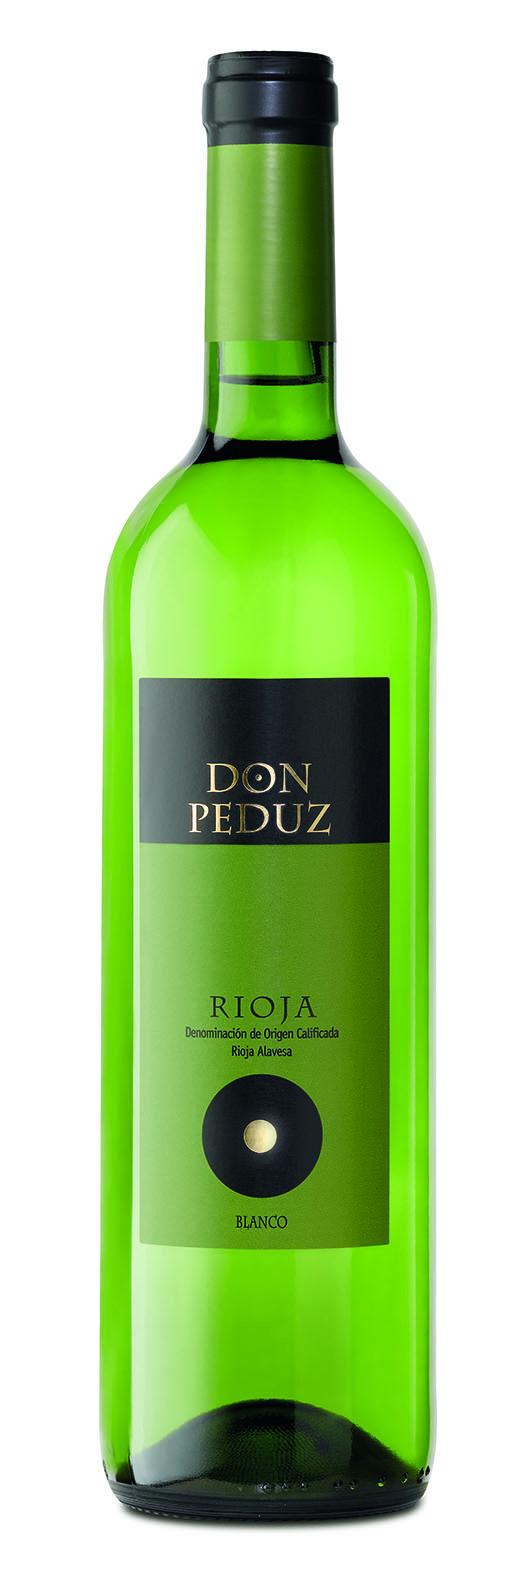 Don Peduz | Hermanos Frias del Val - Winexfood